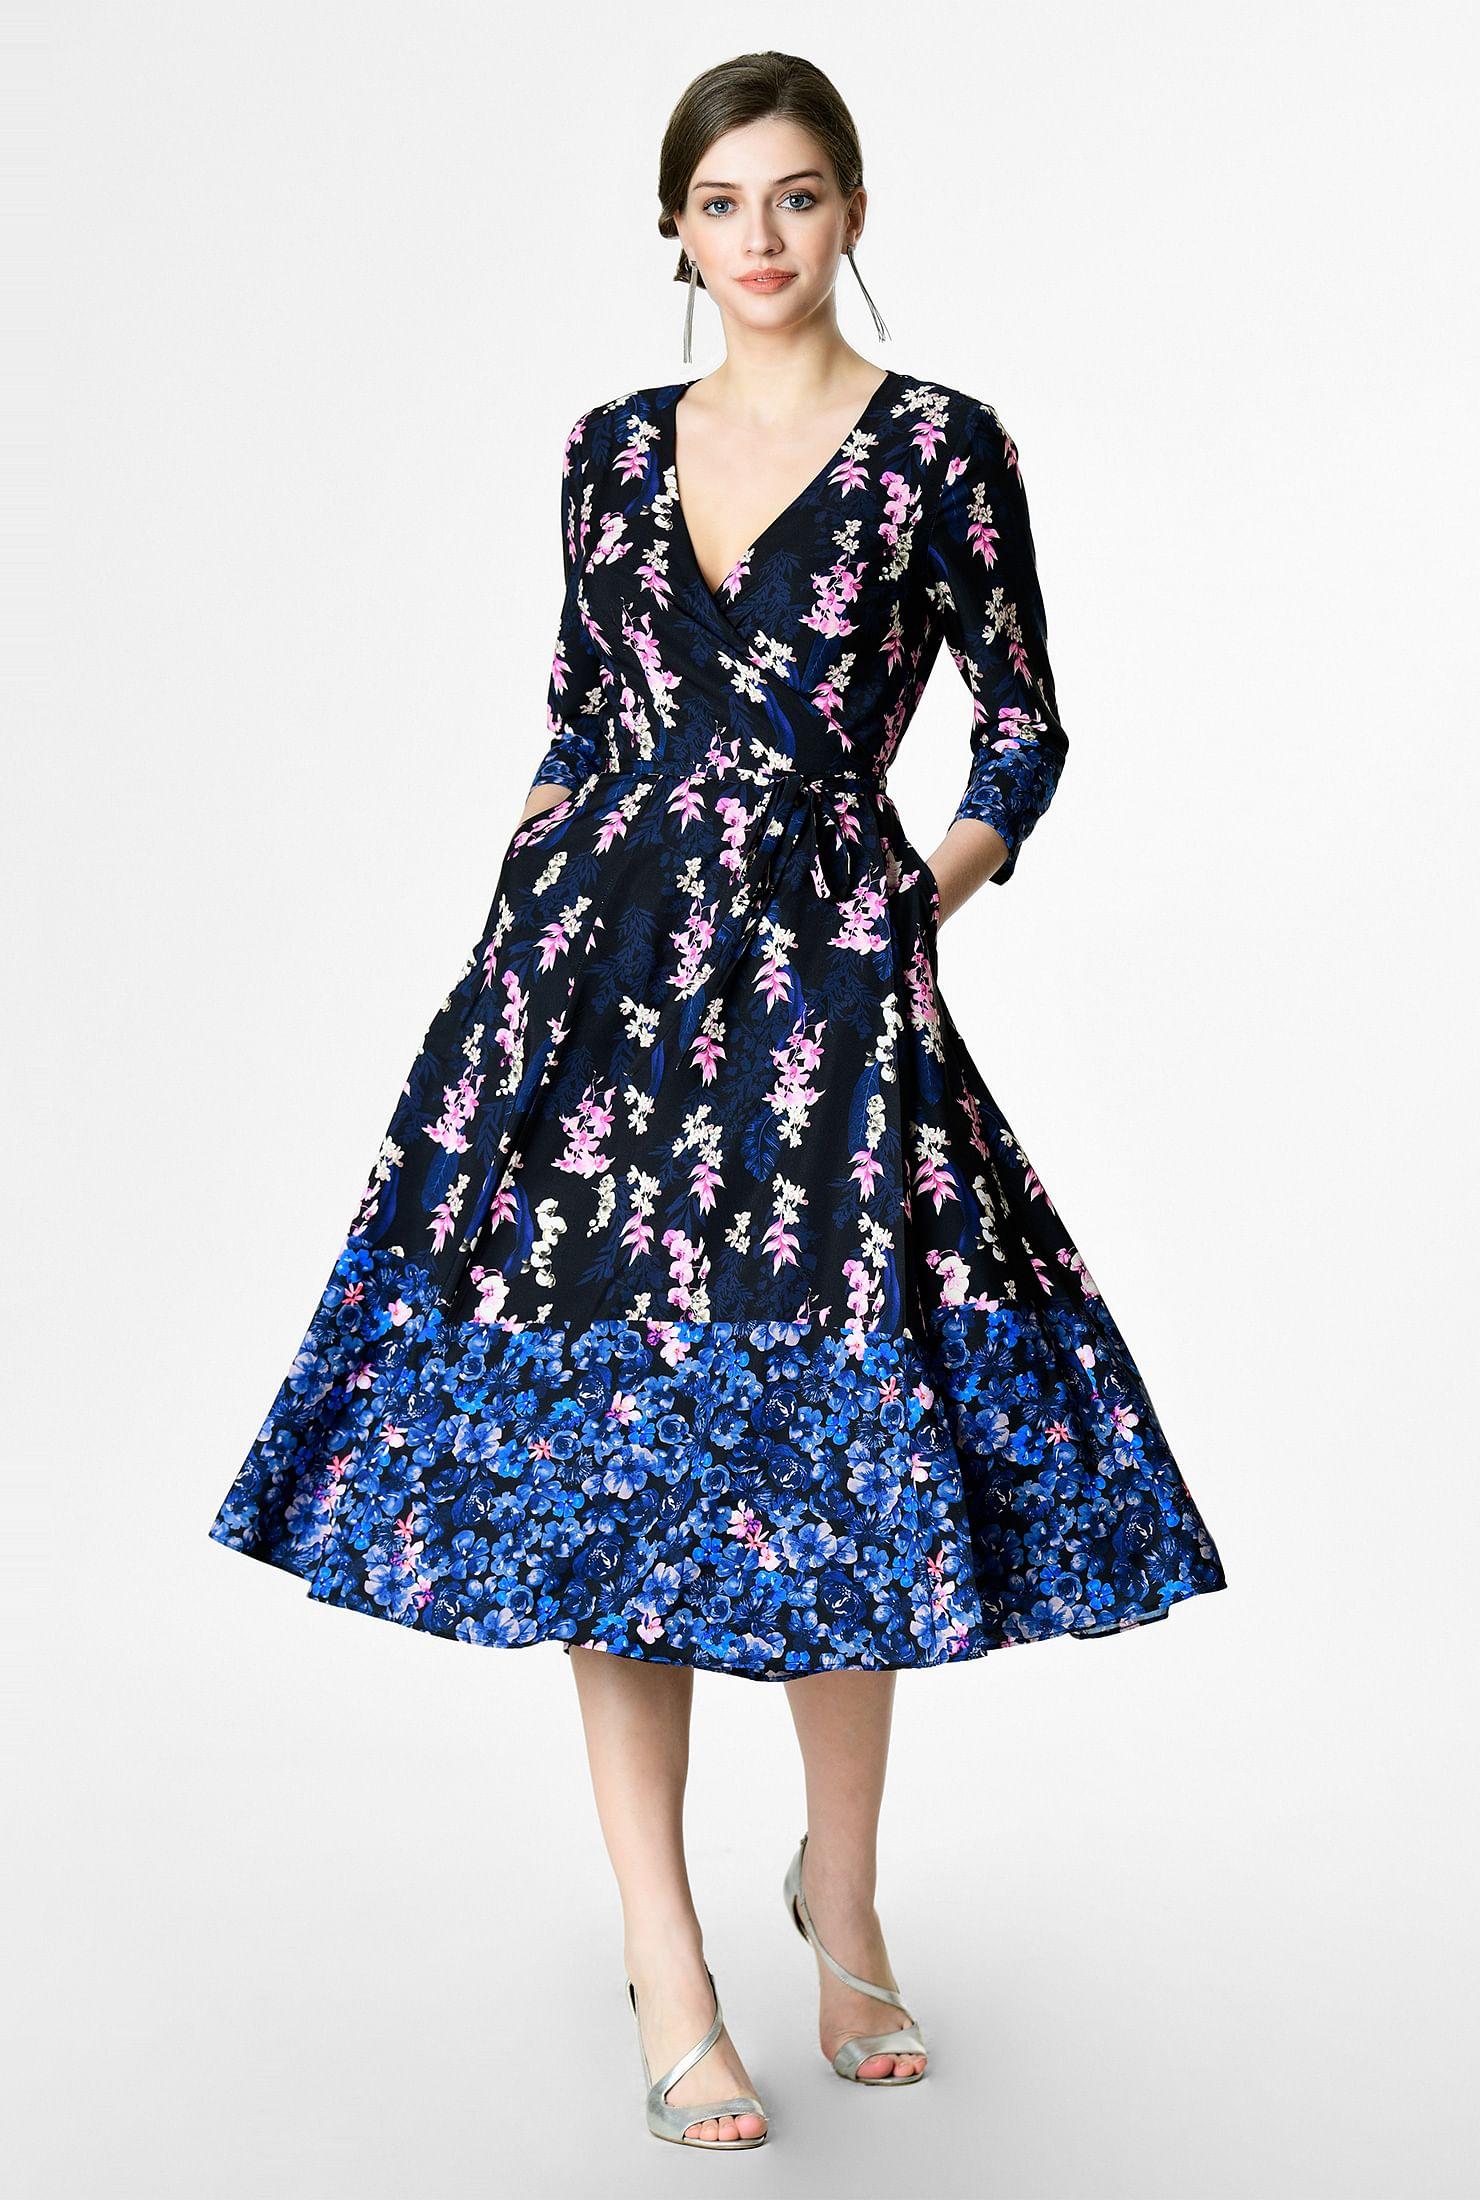 44693ba86f Women s Fashion Clothing 0-36W and Custom